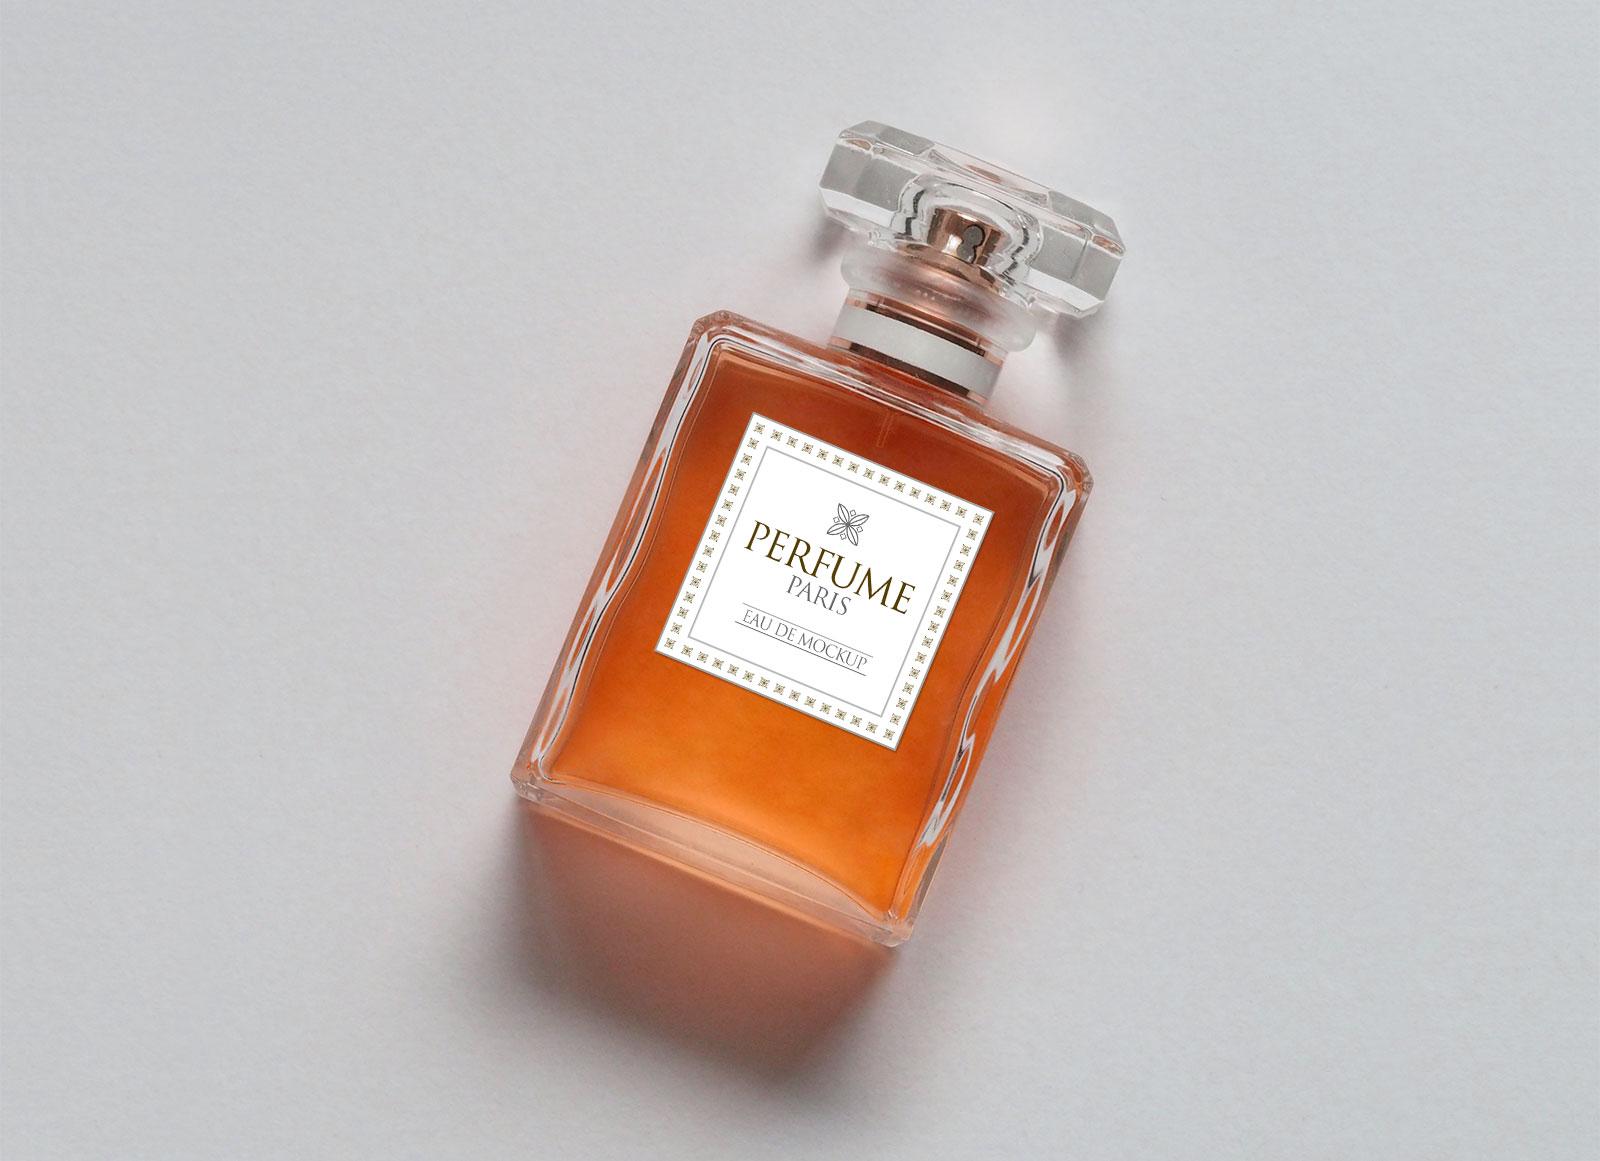 Free-Scent-Perfume-Body-Spray-Bottle-Mockup-PSD